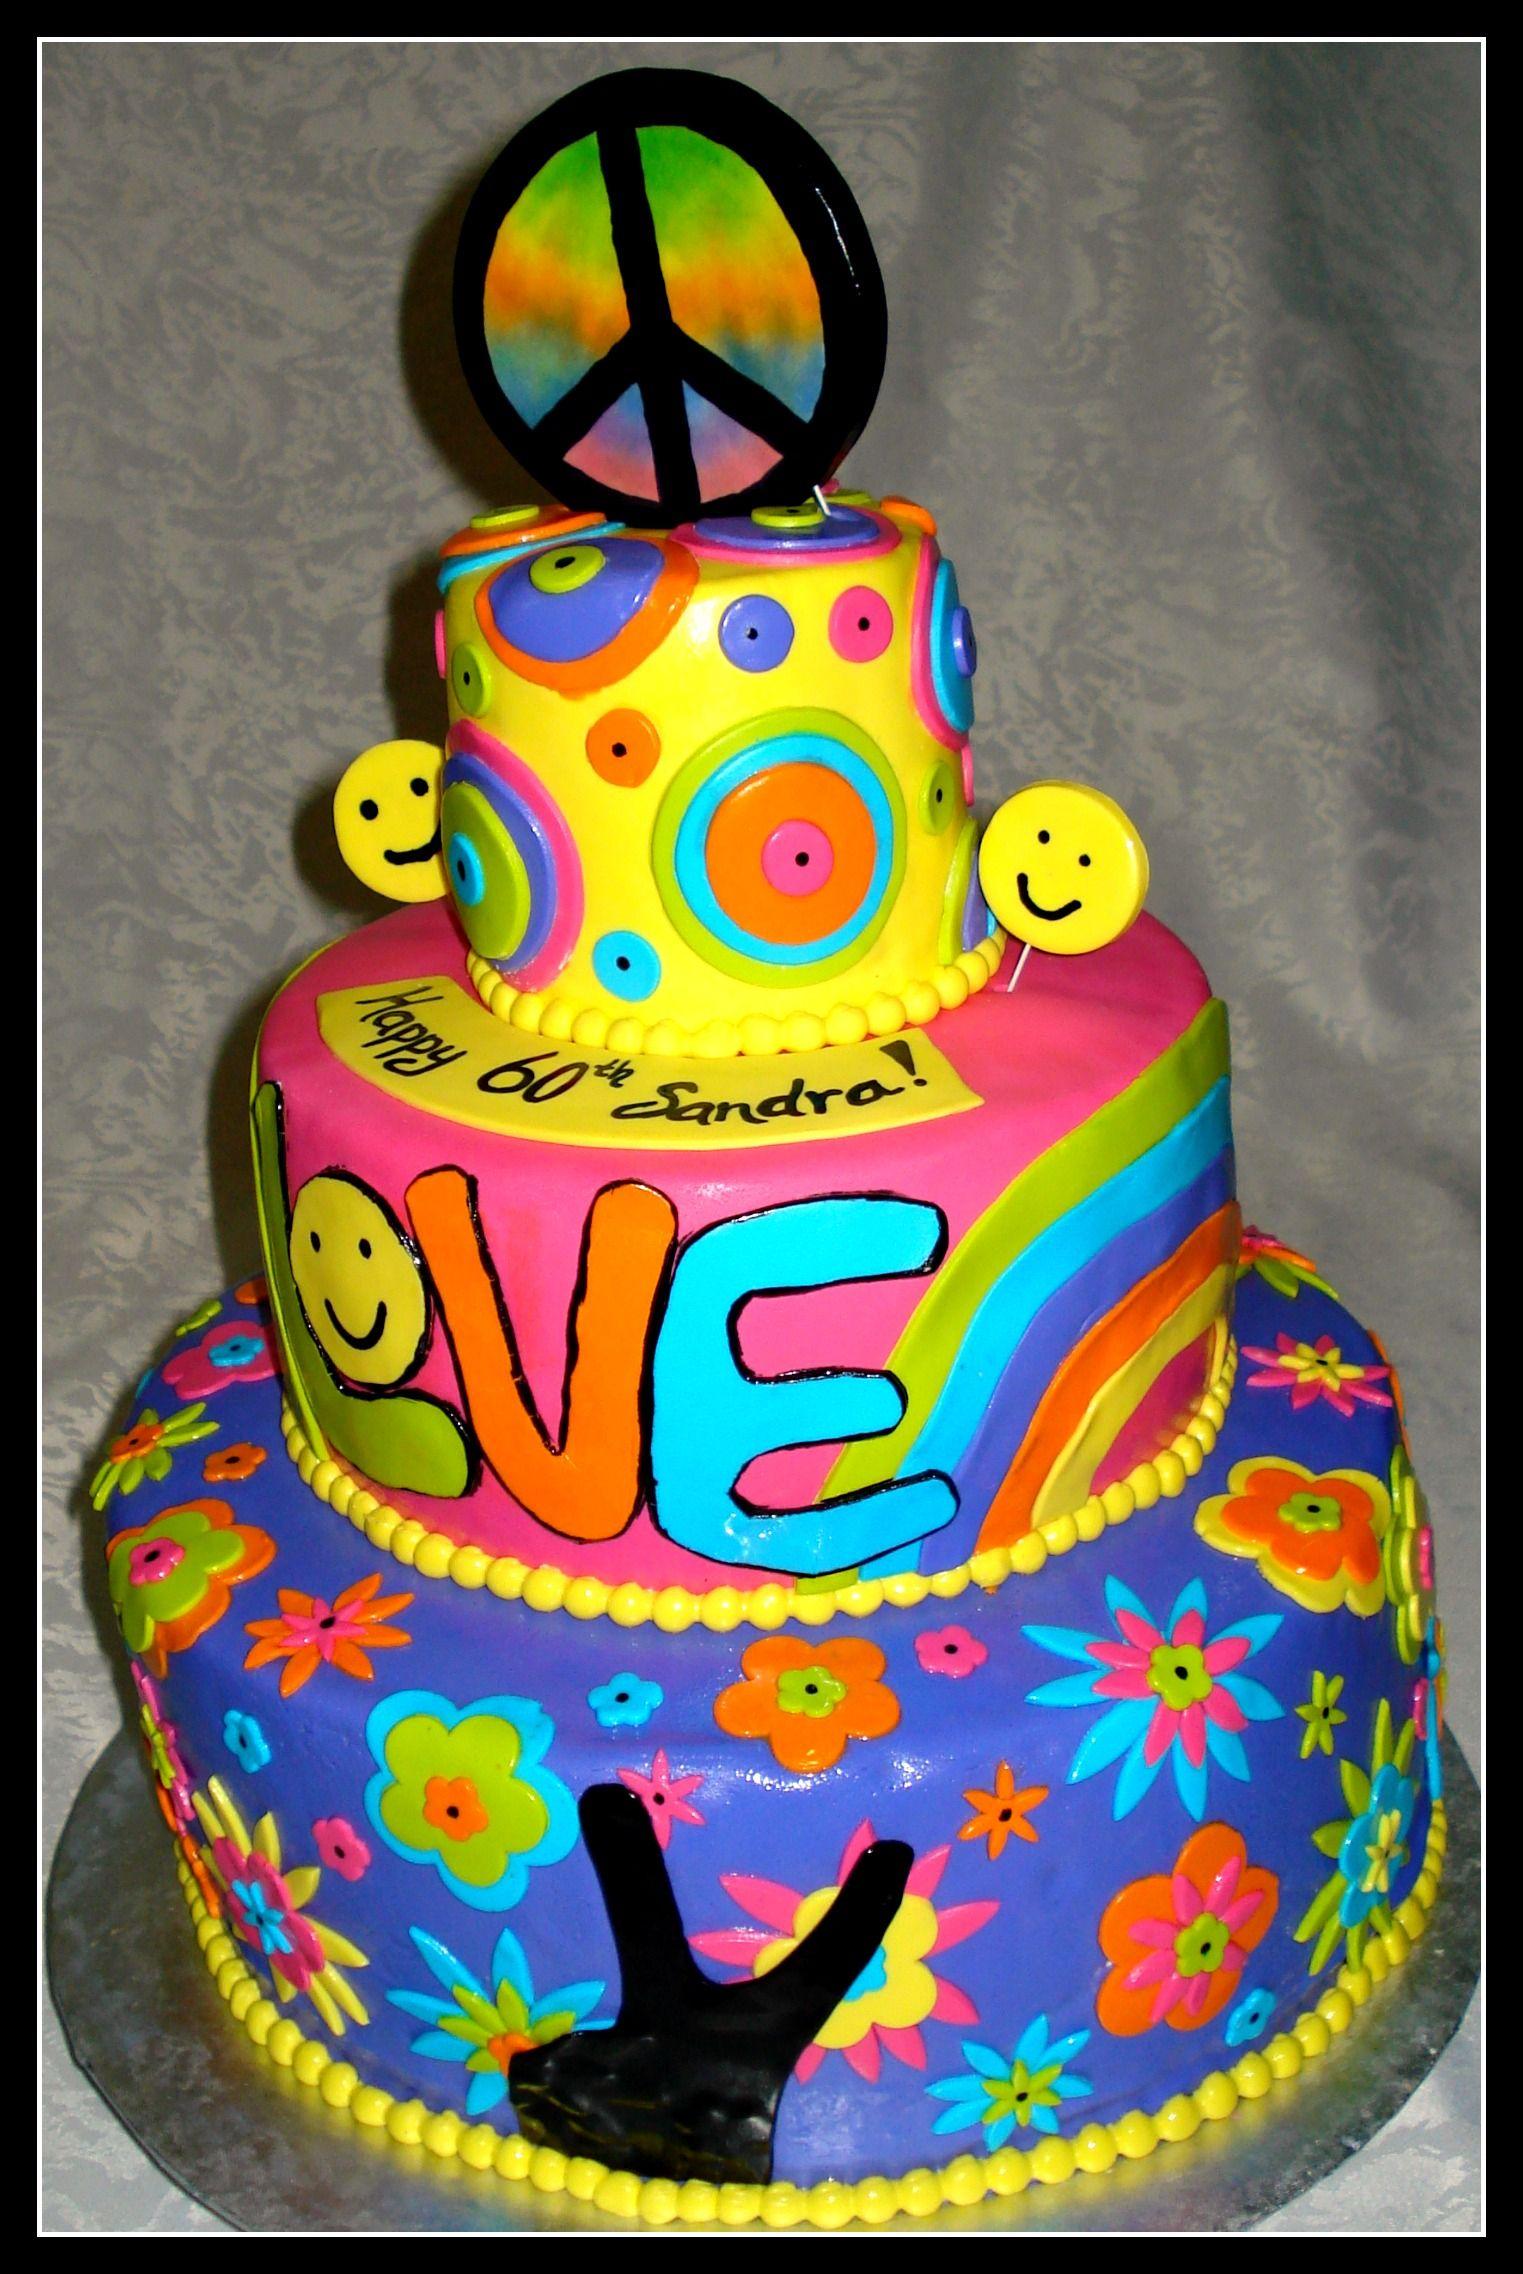 Awe Inspiring Groovy Birthday Cake Cake Hippie Cake Cupcake Cakes Personalised Birthday Cards Cominlily Jamesorg